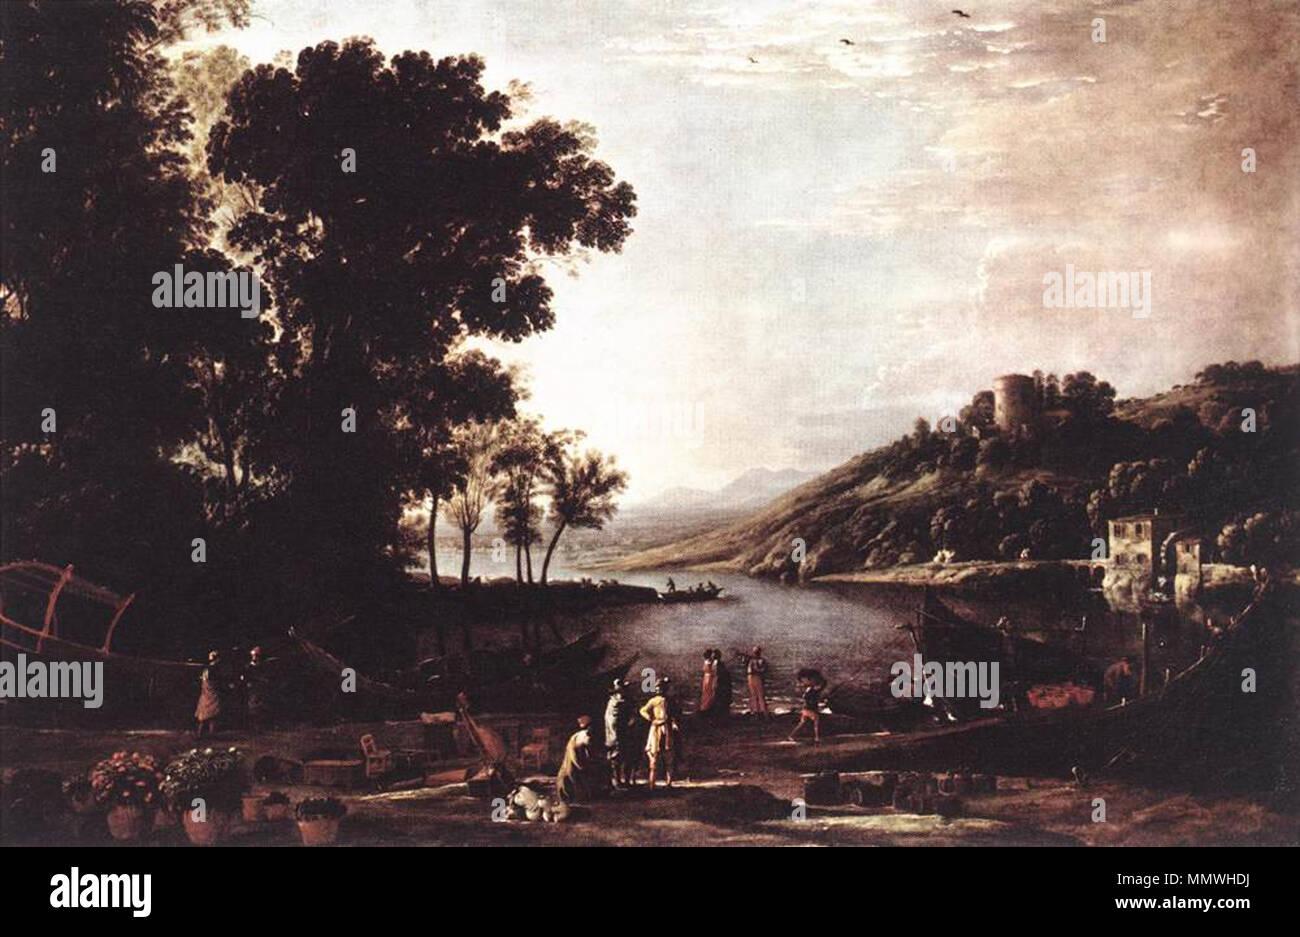 Landscape with Merchants. circa 1630. Claude Lorrain - Landscape with Merchants - WGA04975 Stock Photo